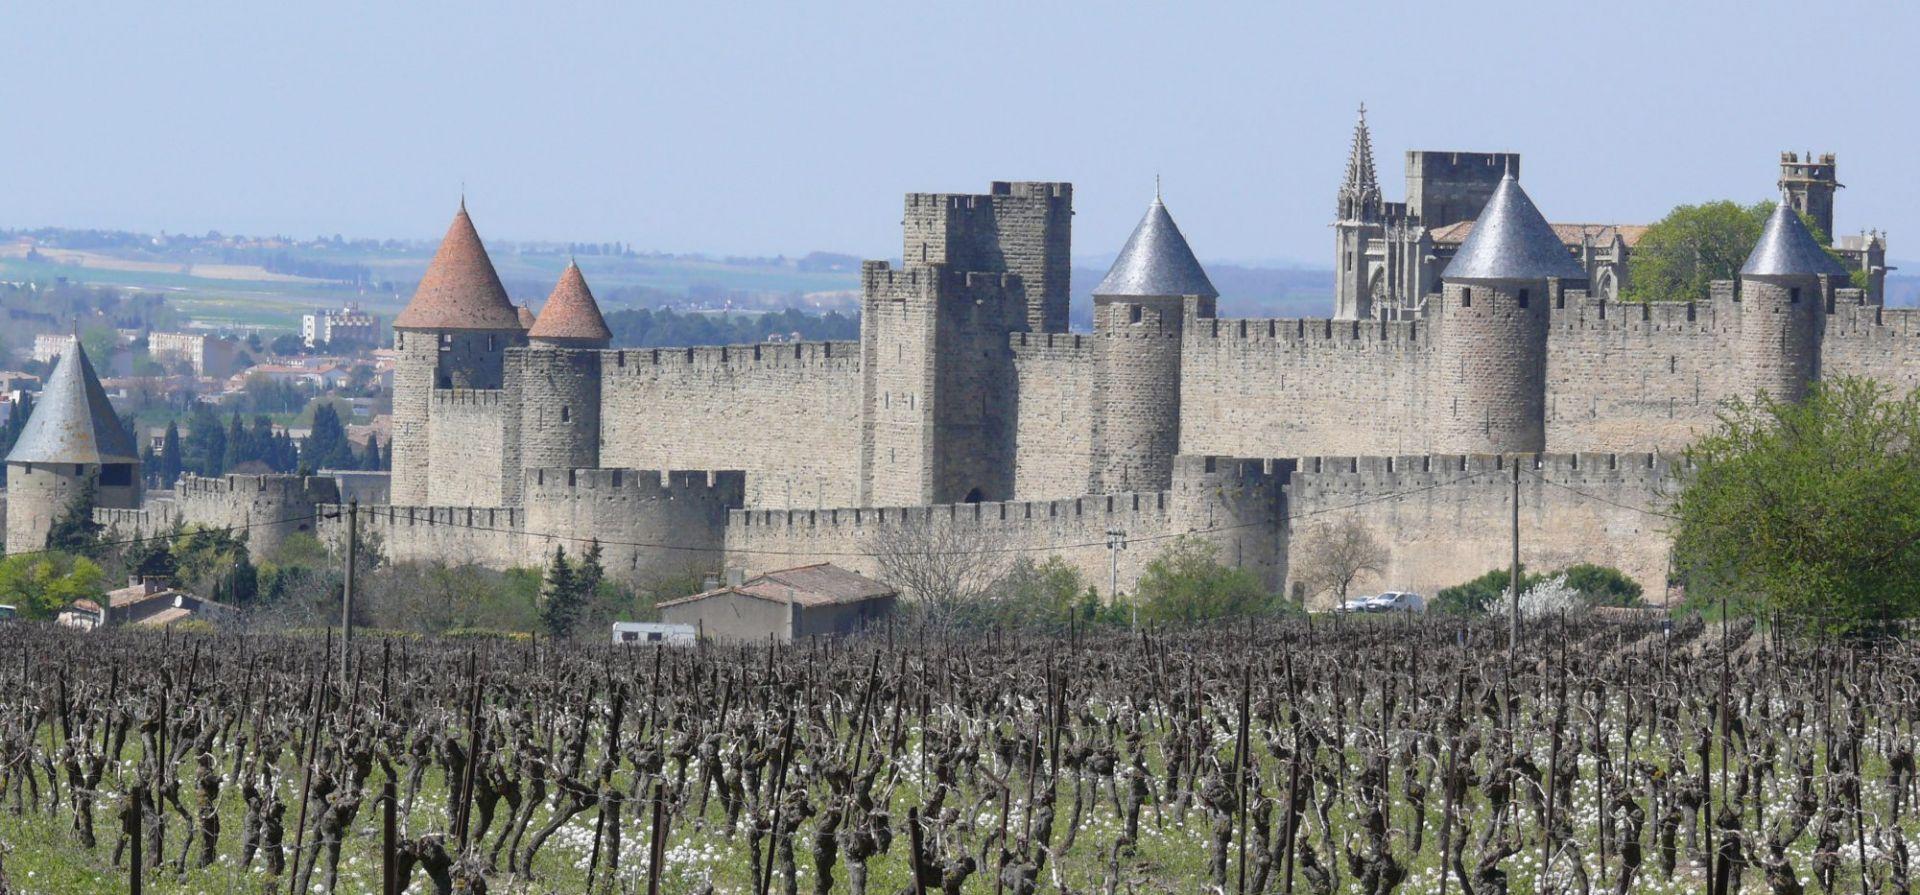 Het beste spirituele reisverhaal van 2016: Carcassonne